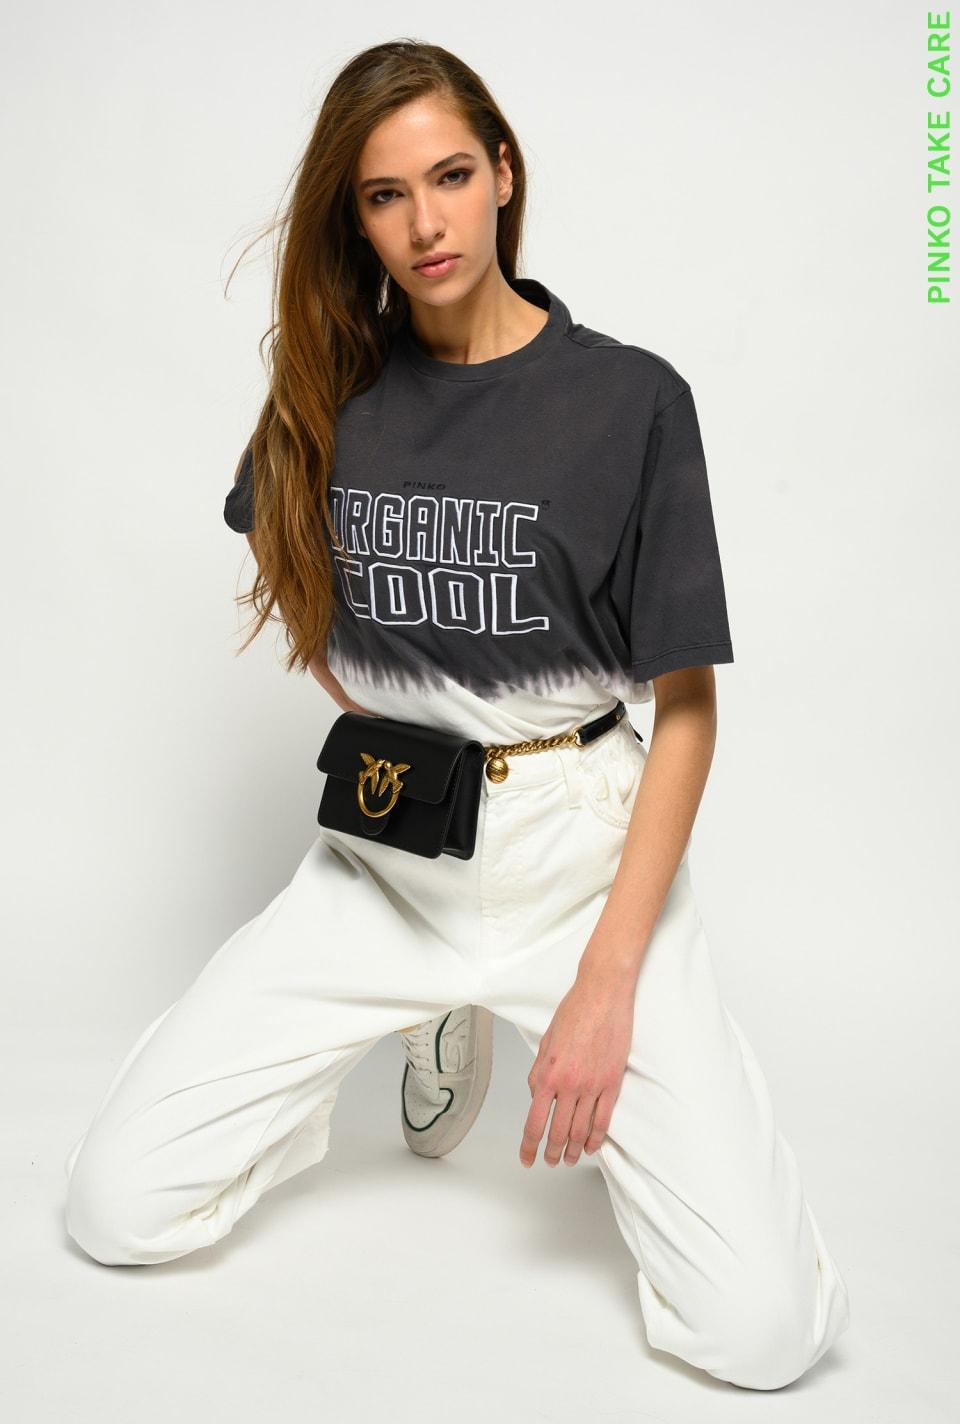 Camiseta Organicool - Pinko